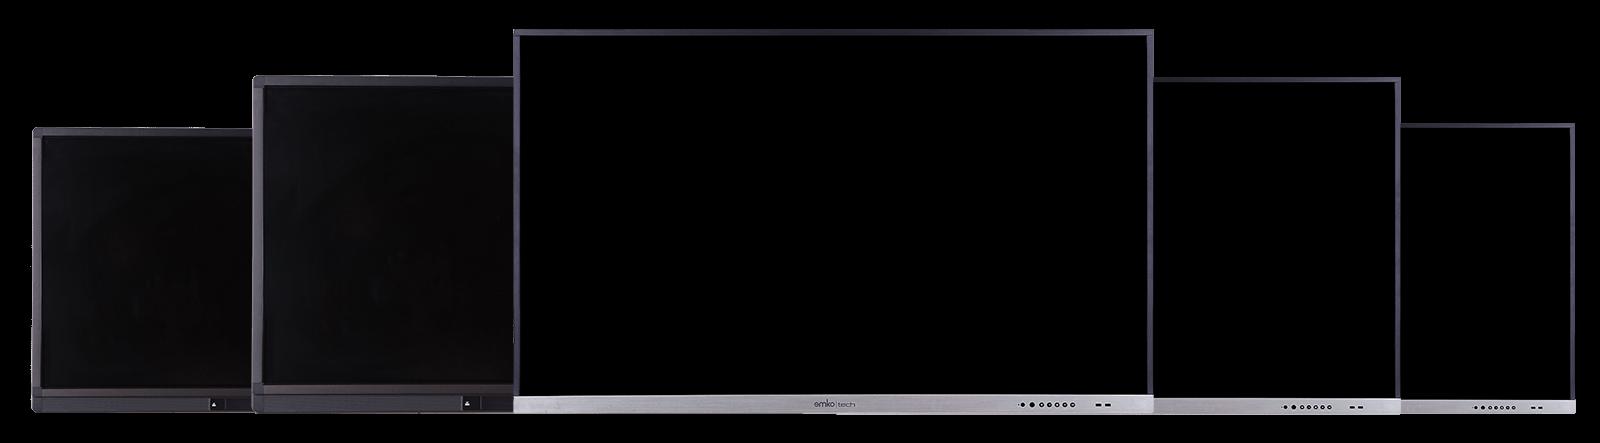 Emkotech LED akıllı tahtalar Resim